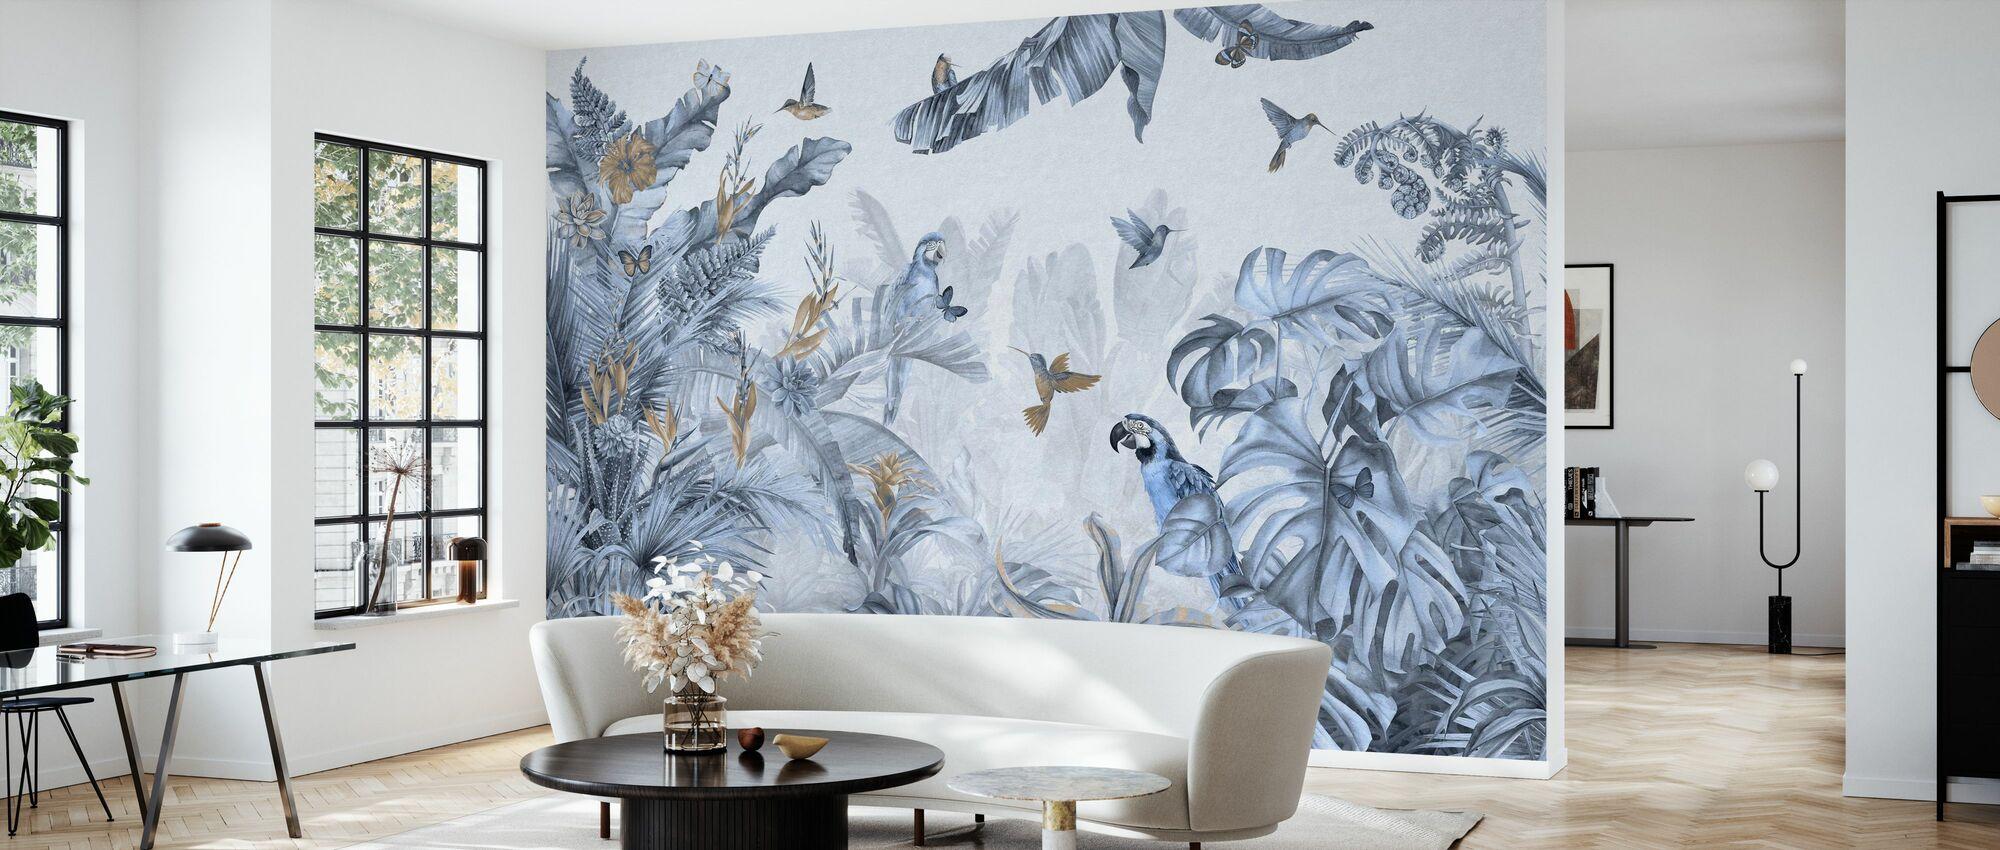 Papegøyer Paradise - Blå - Tapet - Stue